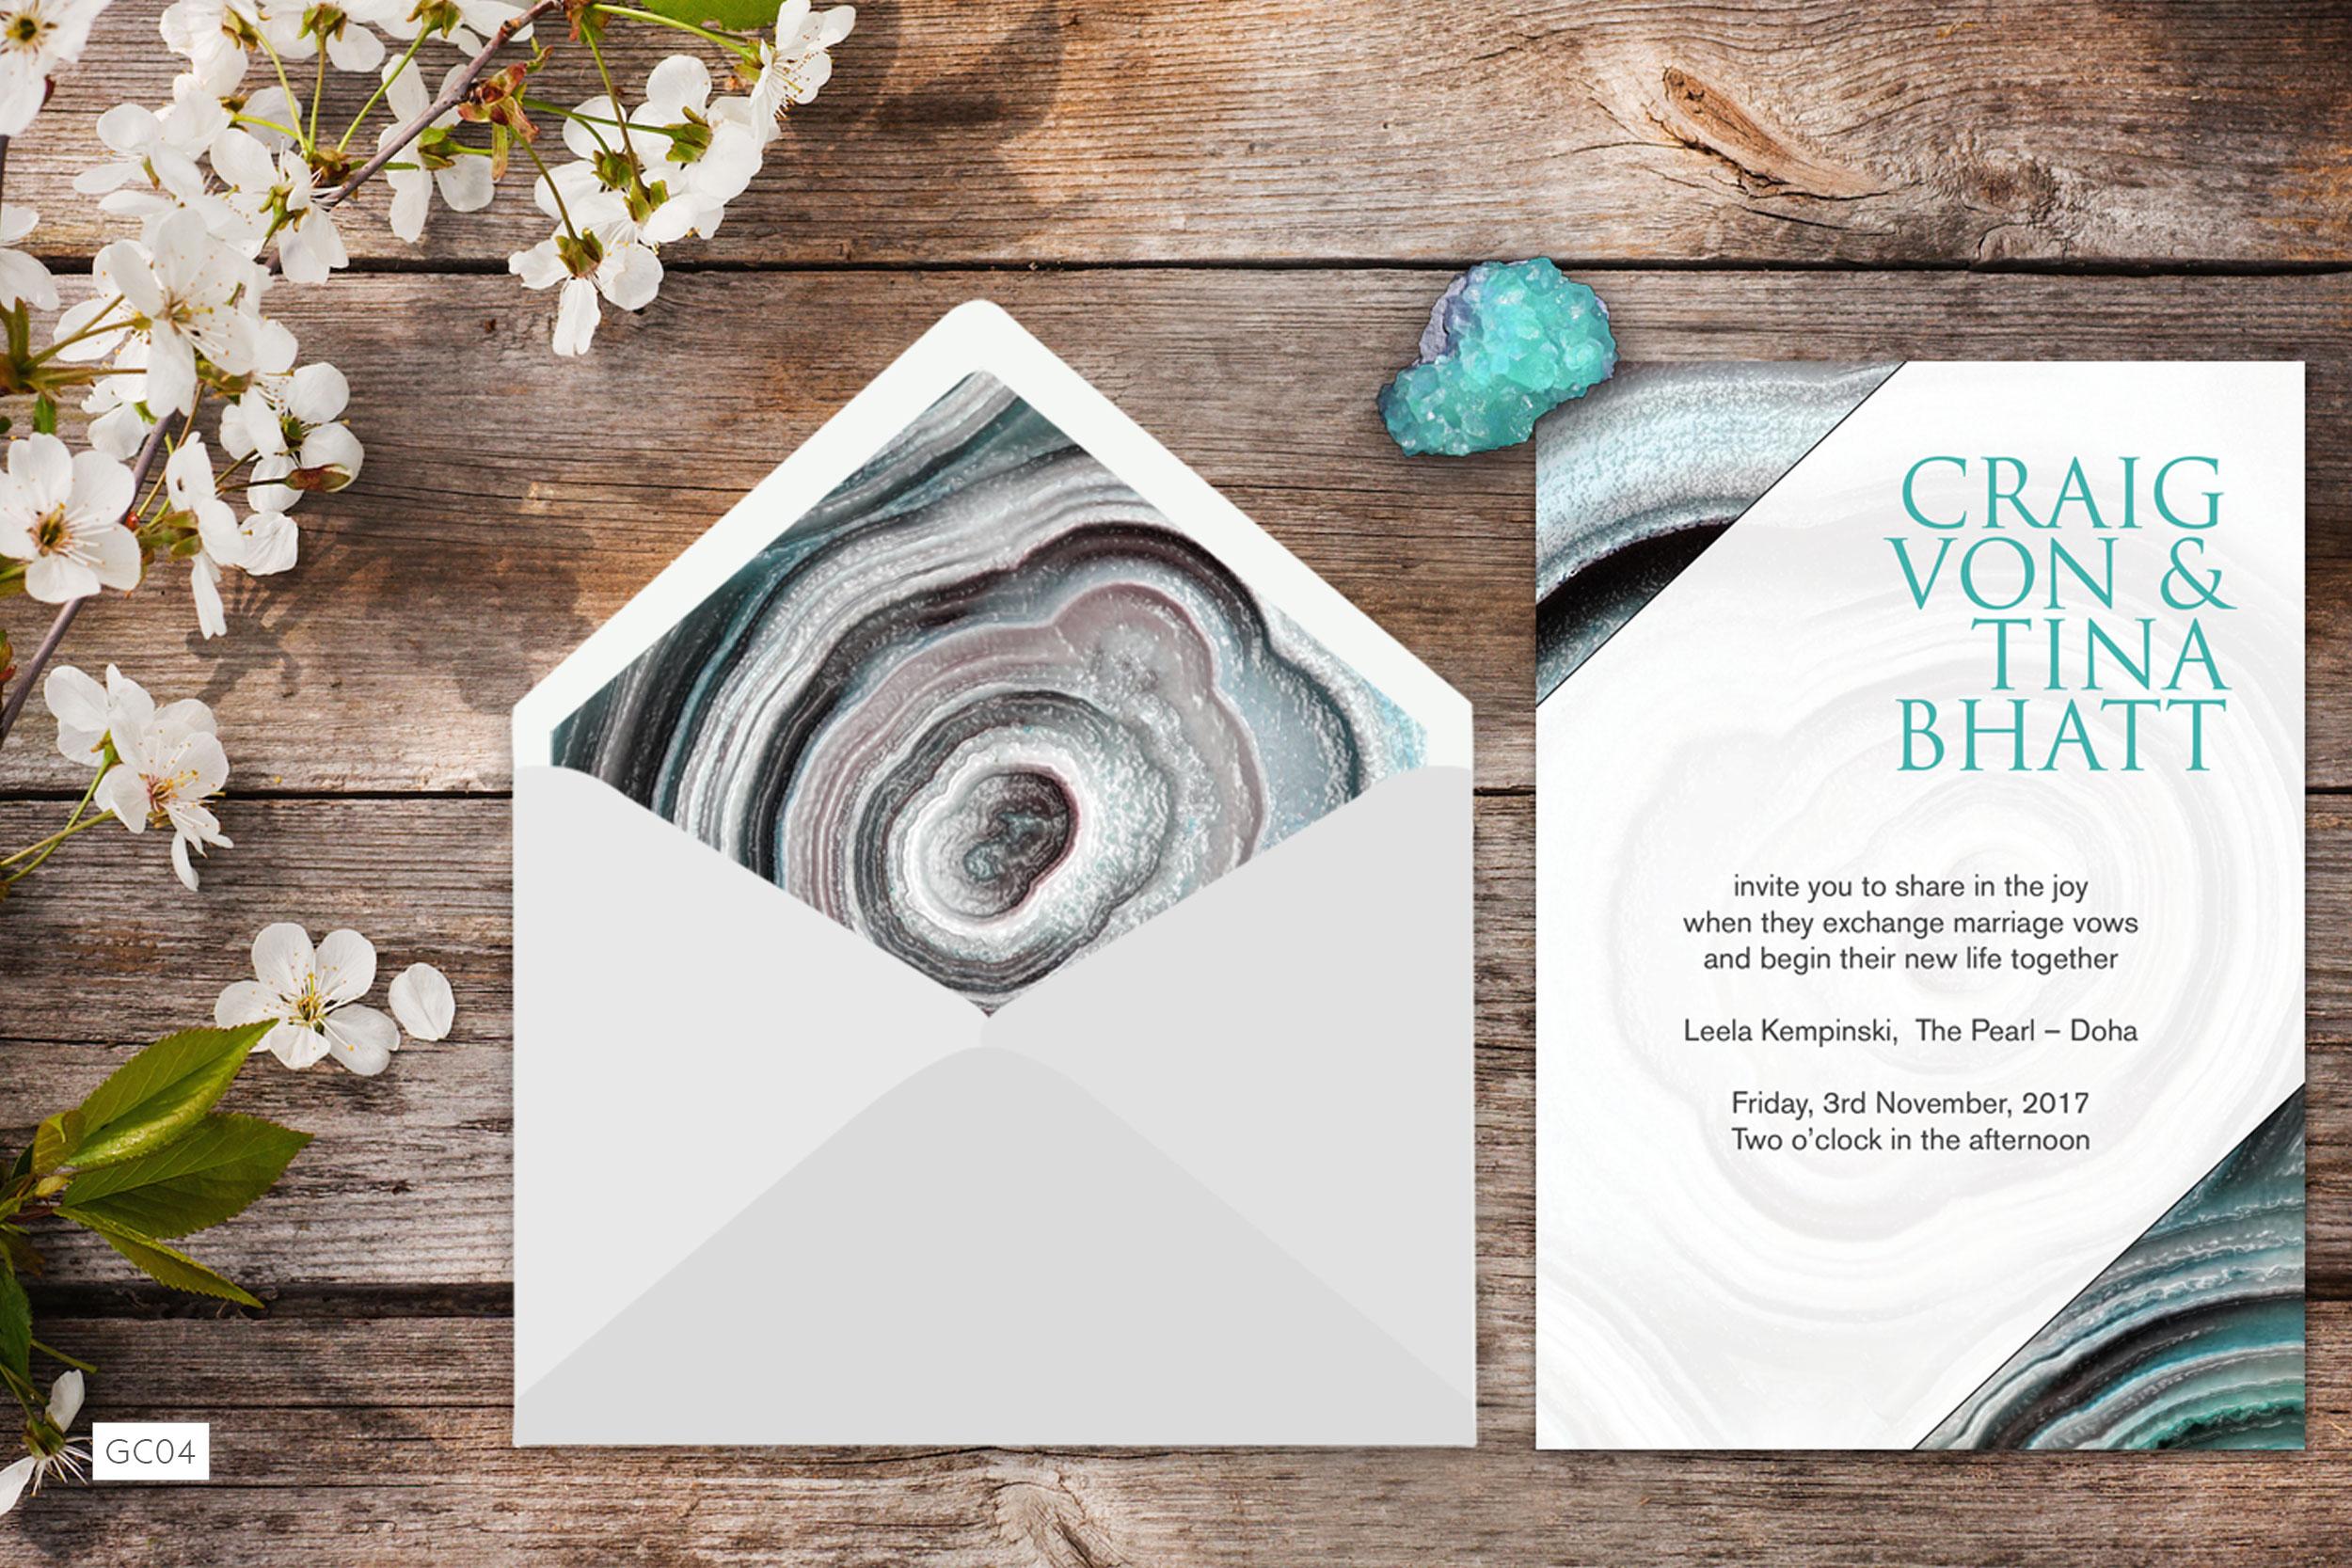 turquoise-geode-and-crystal-wedding-invitation.jpg